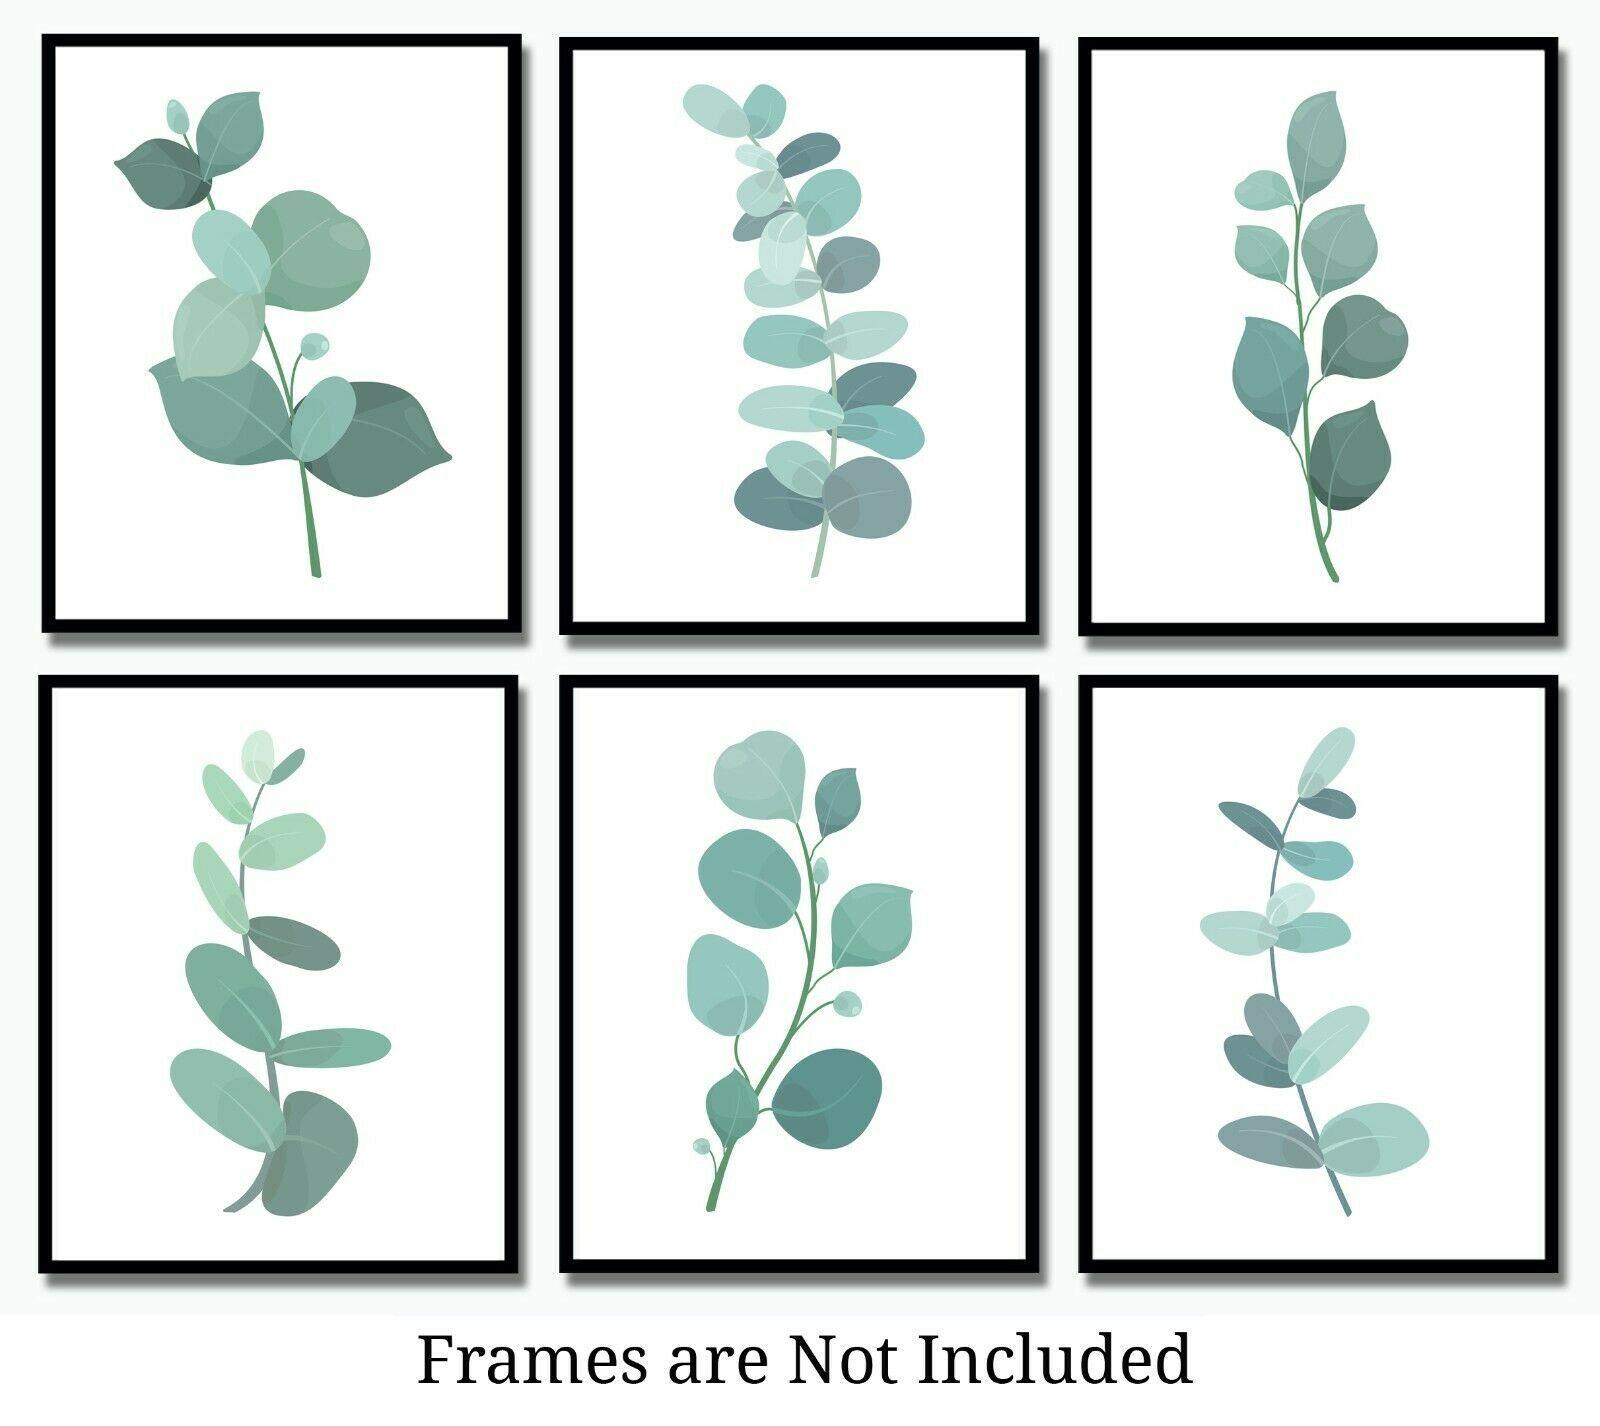 Botanical Prints Eucalyptus Leaves -Set of 6 (8x10)- Plant Leaf Watercolor Style - $17.95